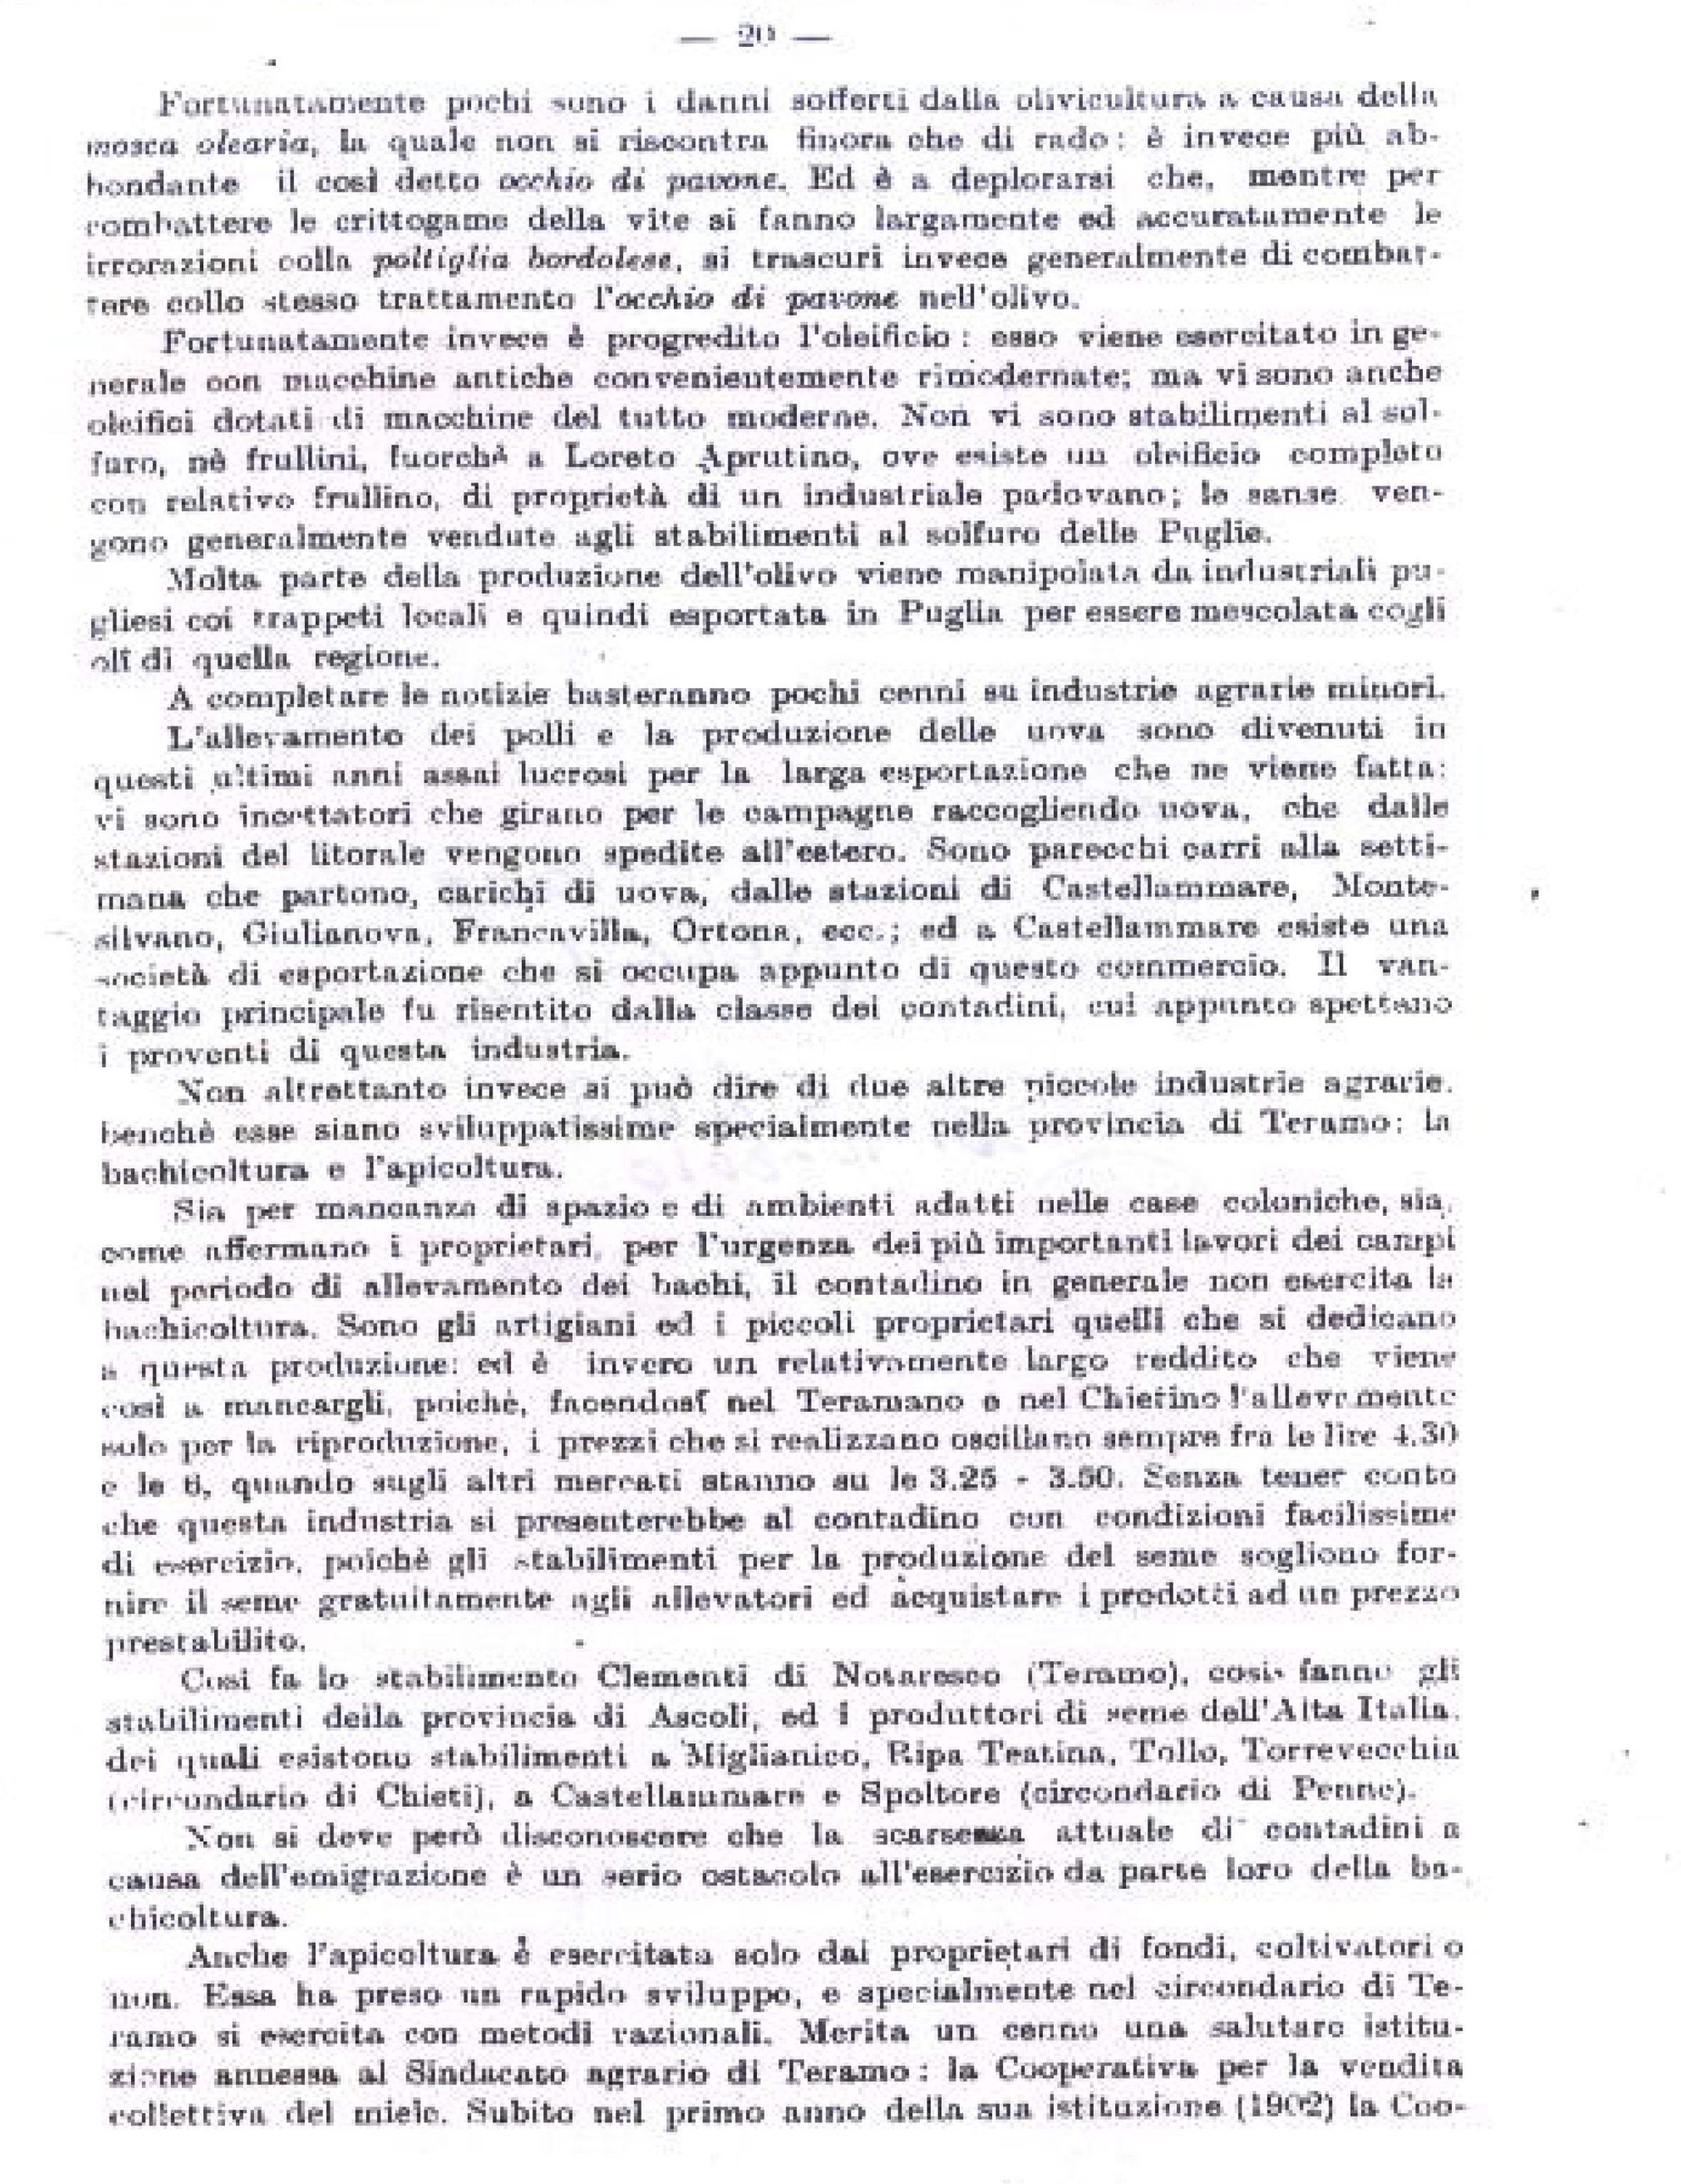 nota storica 1909-3